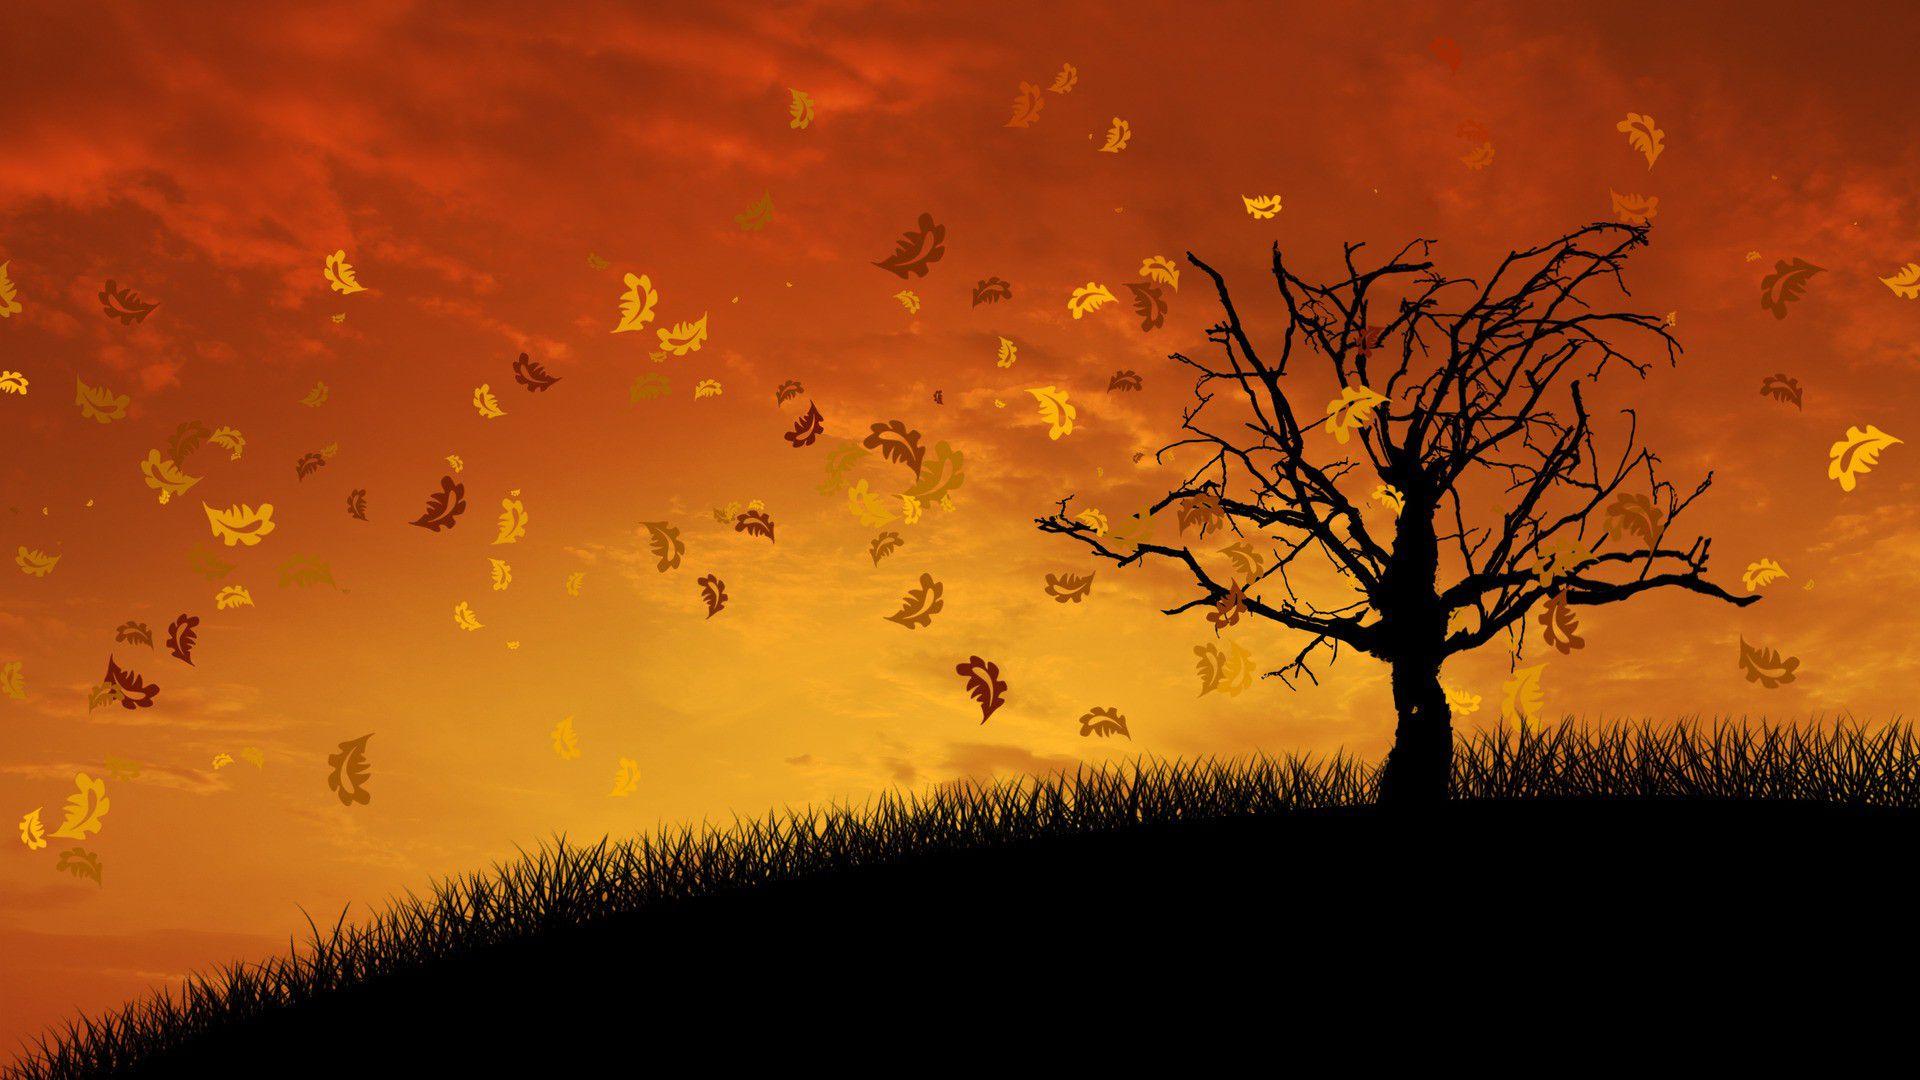 Autumn Art Wallpaper Full Hd With Hd Desktop 1920x1080 Px 925 90 Kb Lugares